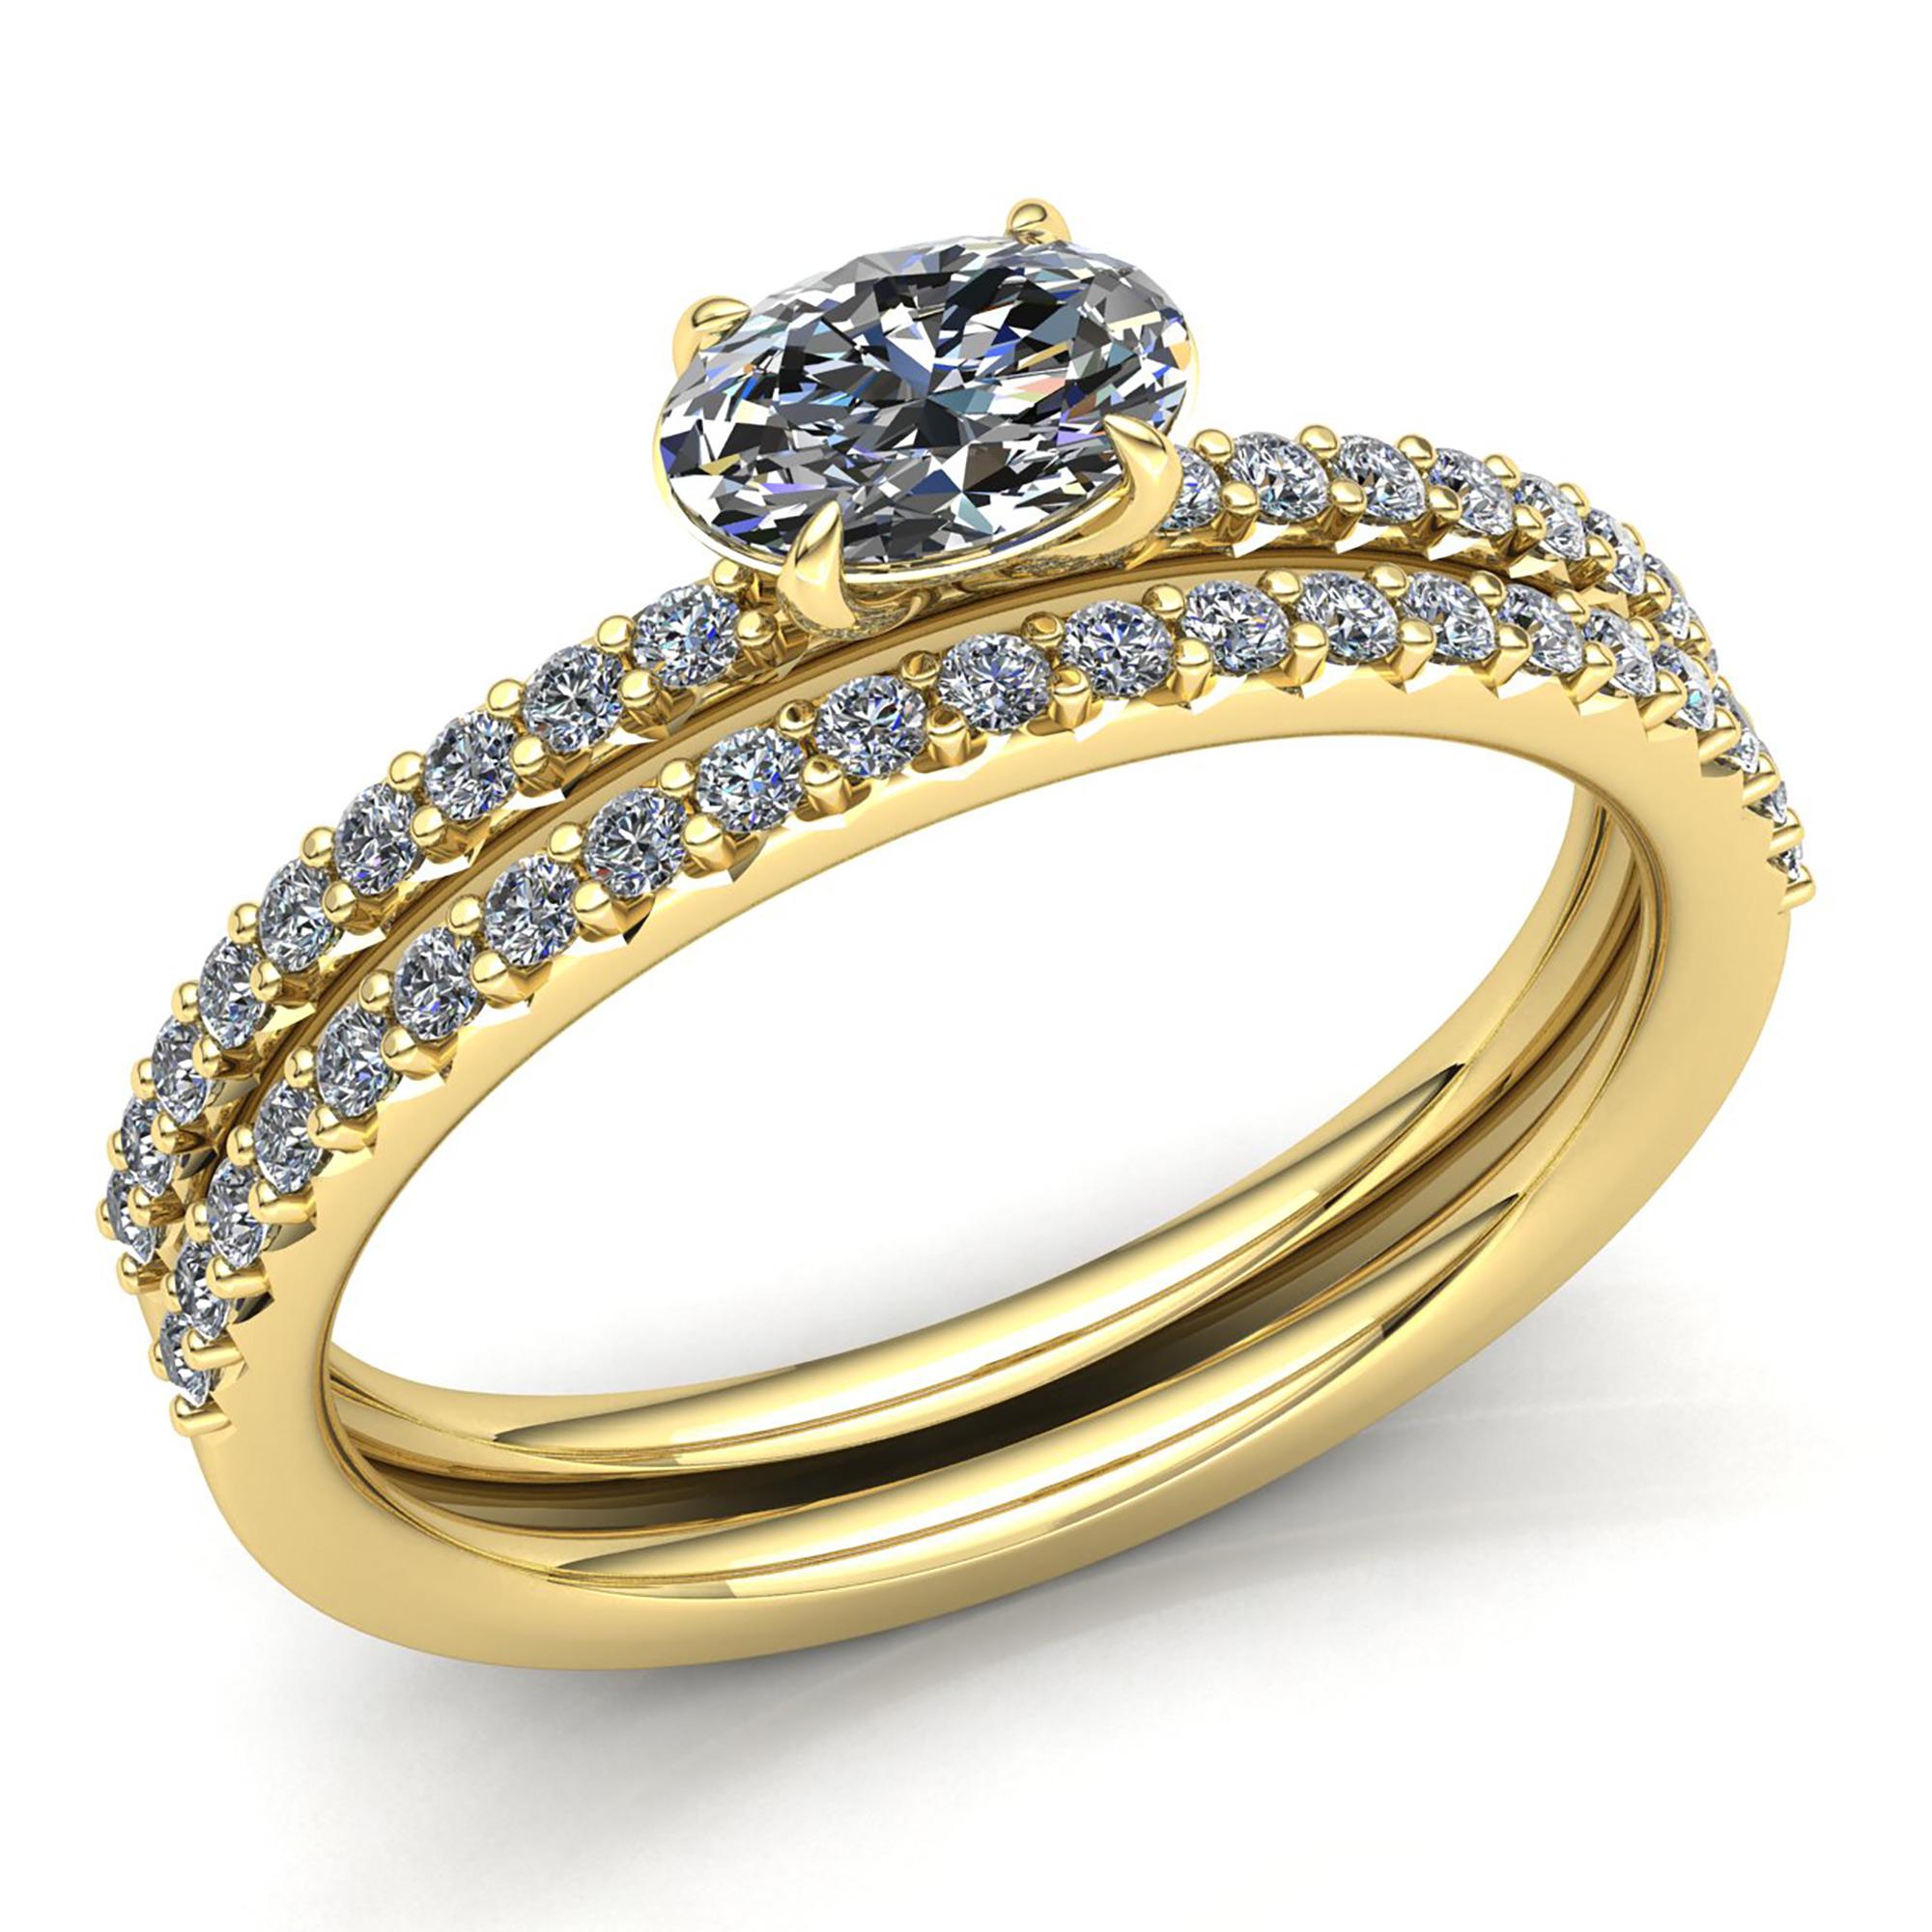 genuine oval diamond ladies bridal set solitaire engagement ring 14k gold ebay. Black Bedroom Furniture Sets. Home Design Ideas